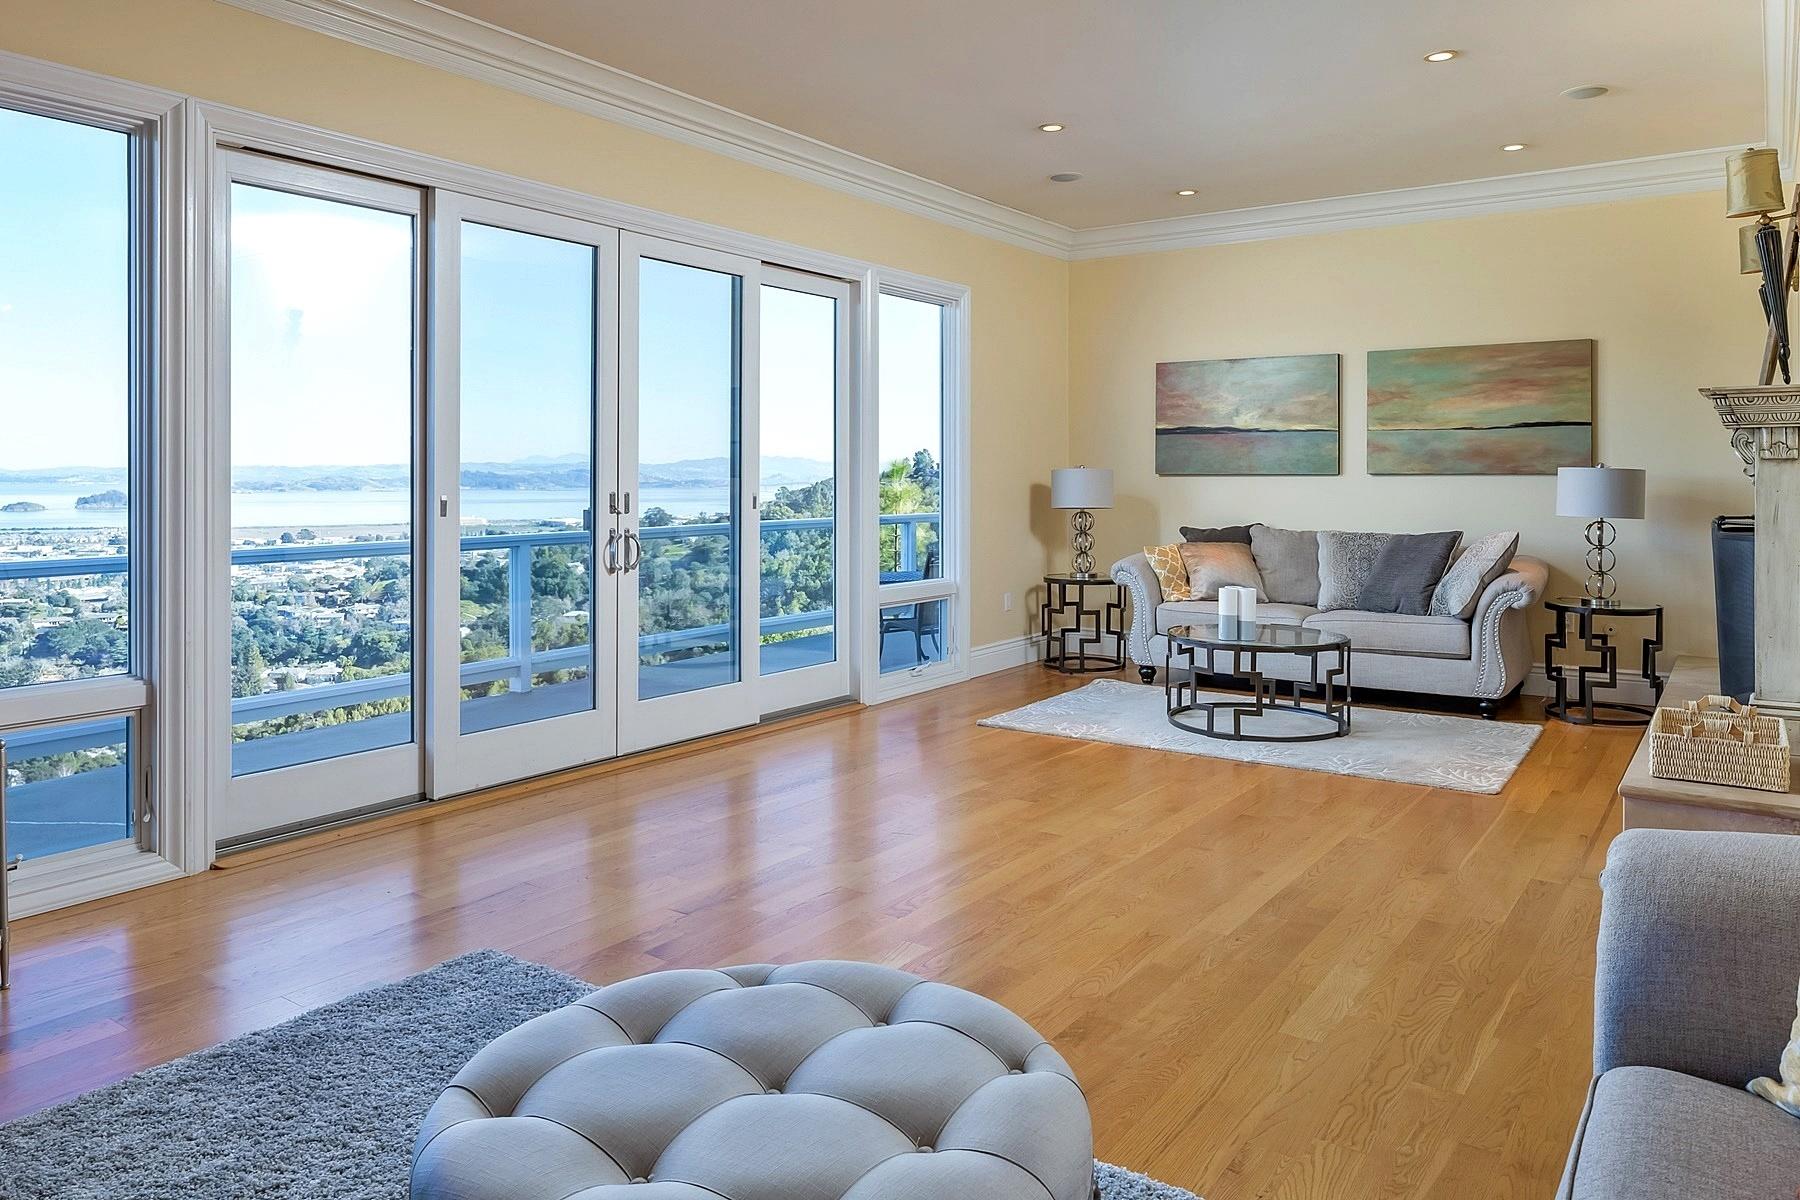 Single Family Home for Sale at Serenity ~ Captivating ~ Panoramic 212 Bret Harte Road San Rafael, California, 94901 United States